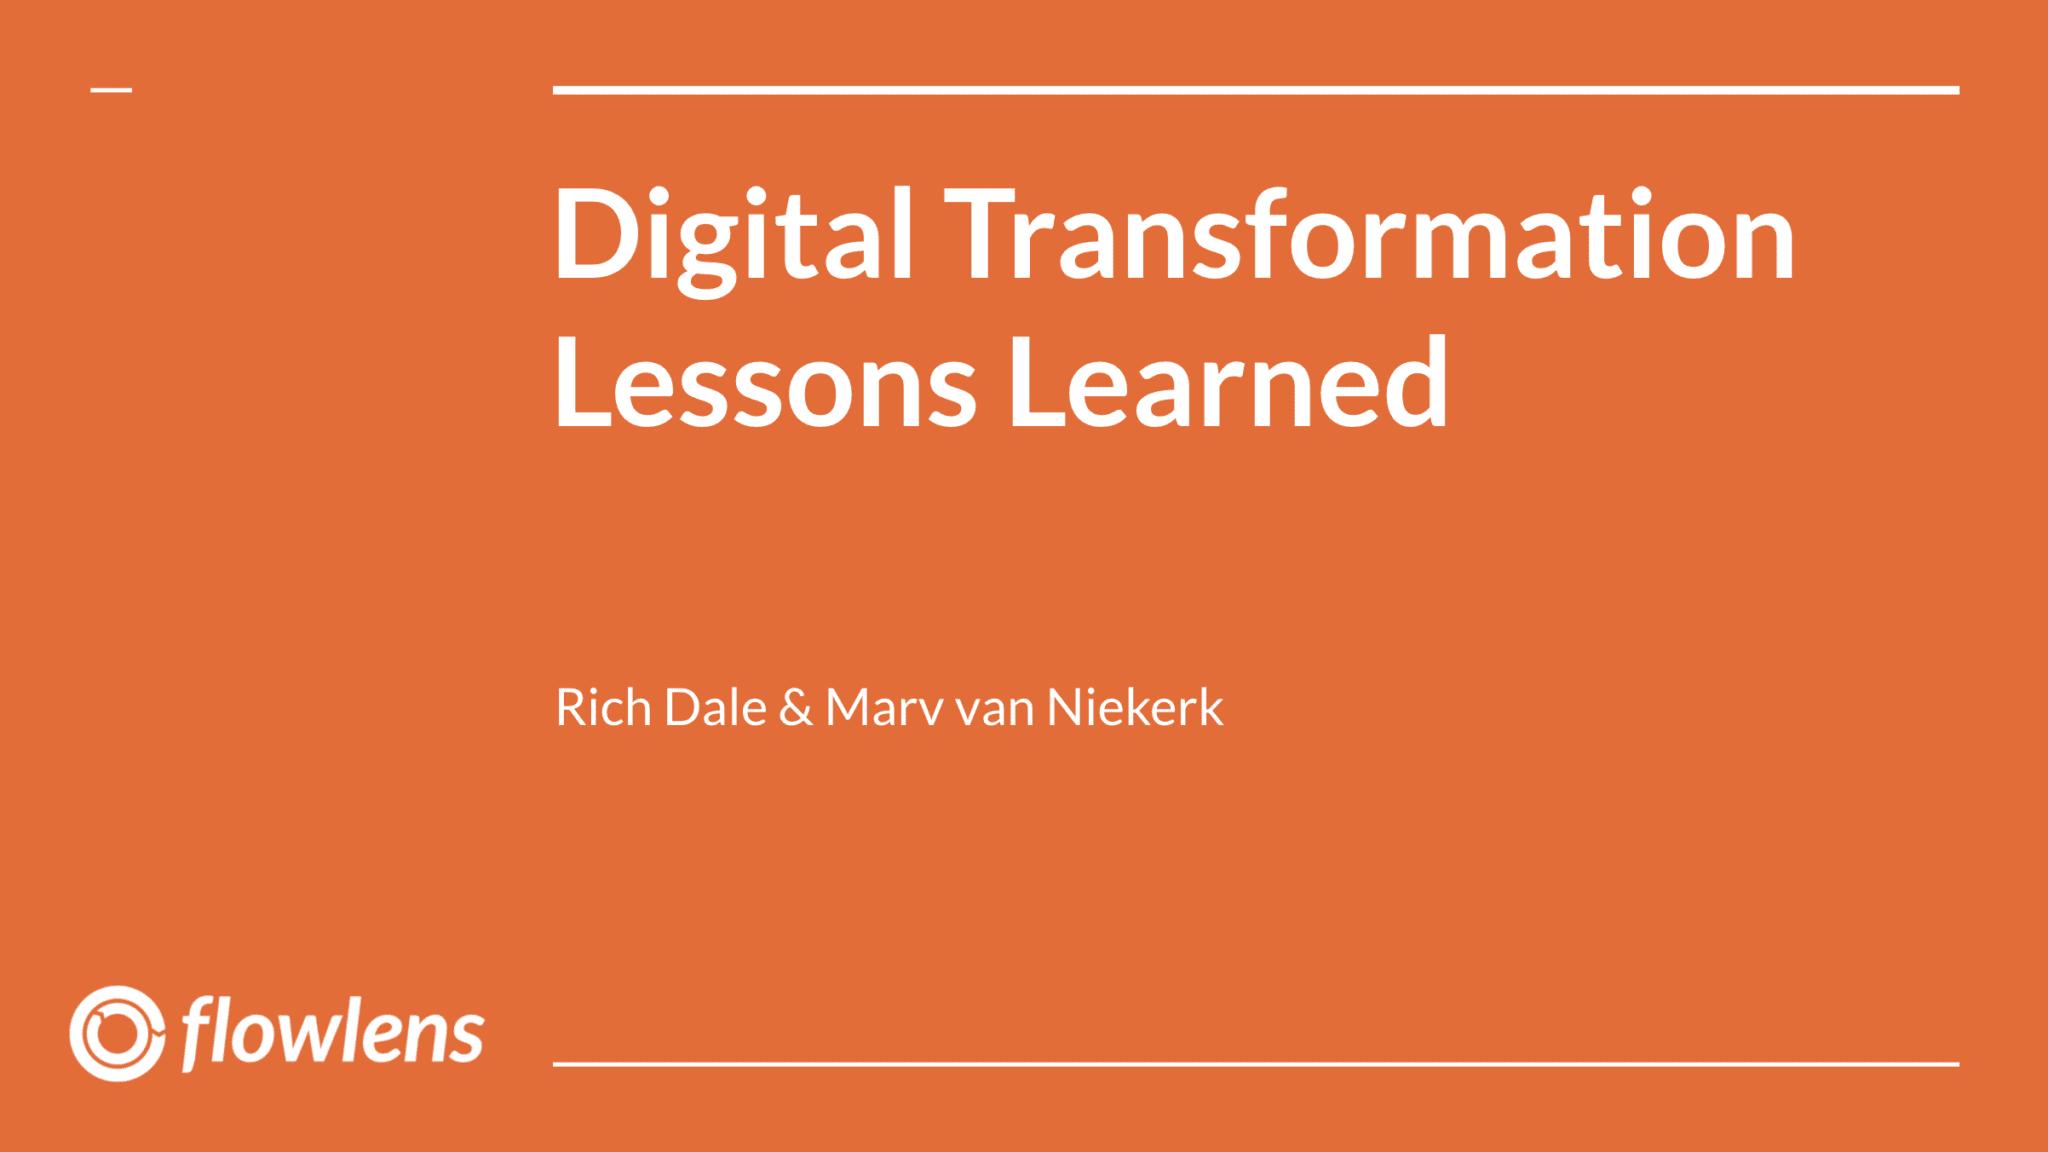 Digital Transformation Lessons Learned title slide